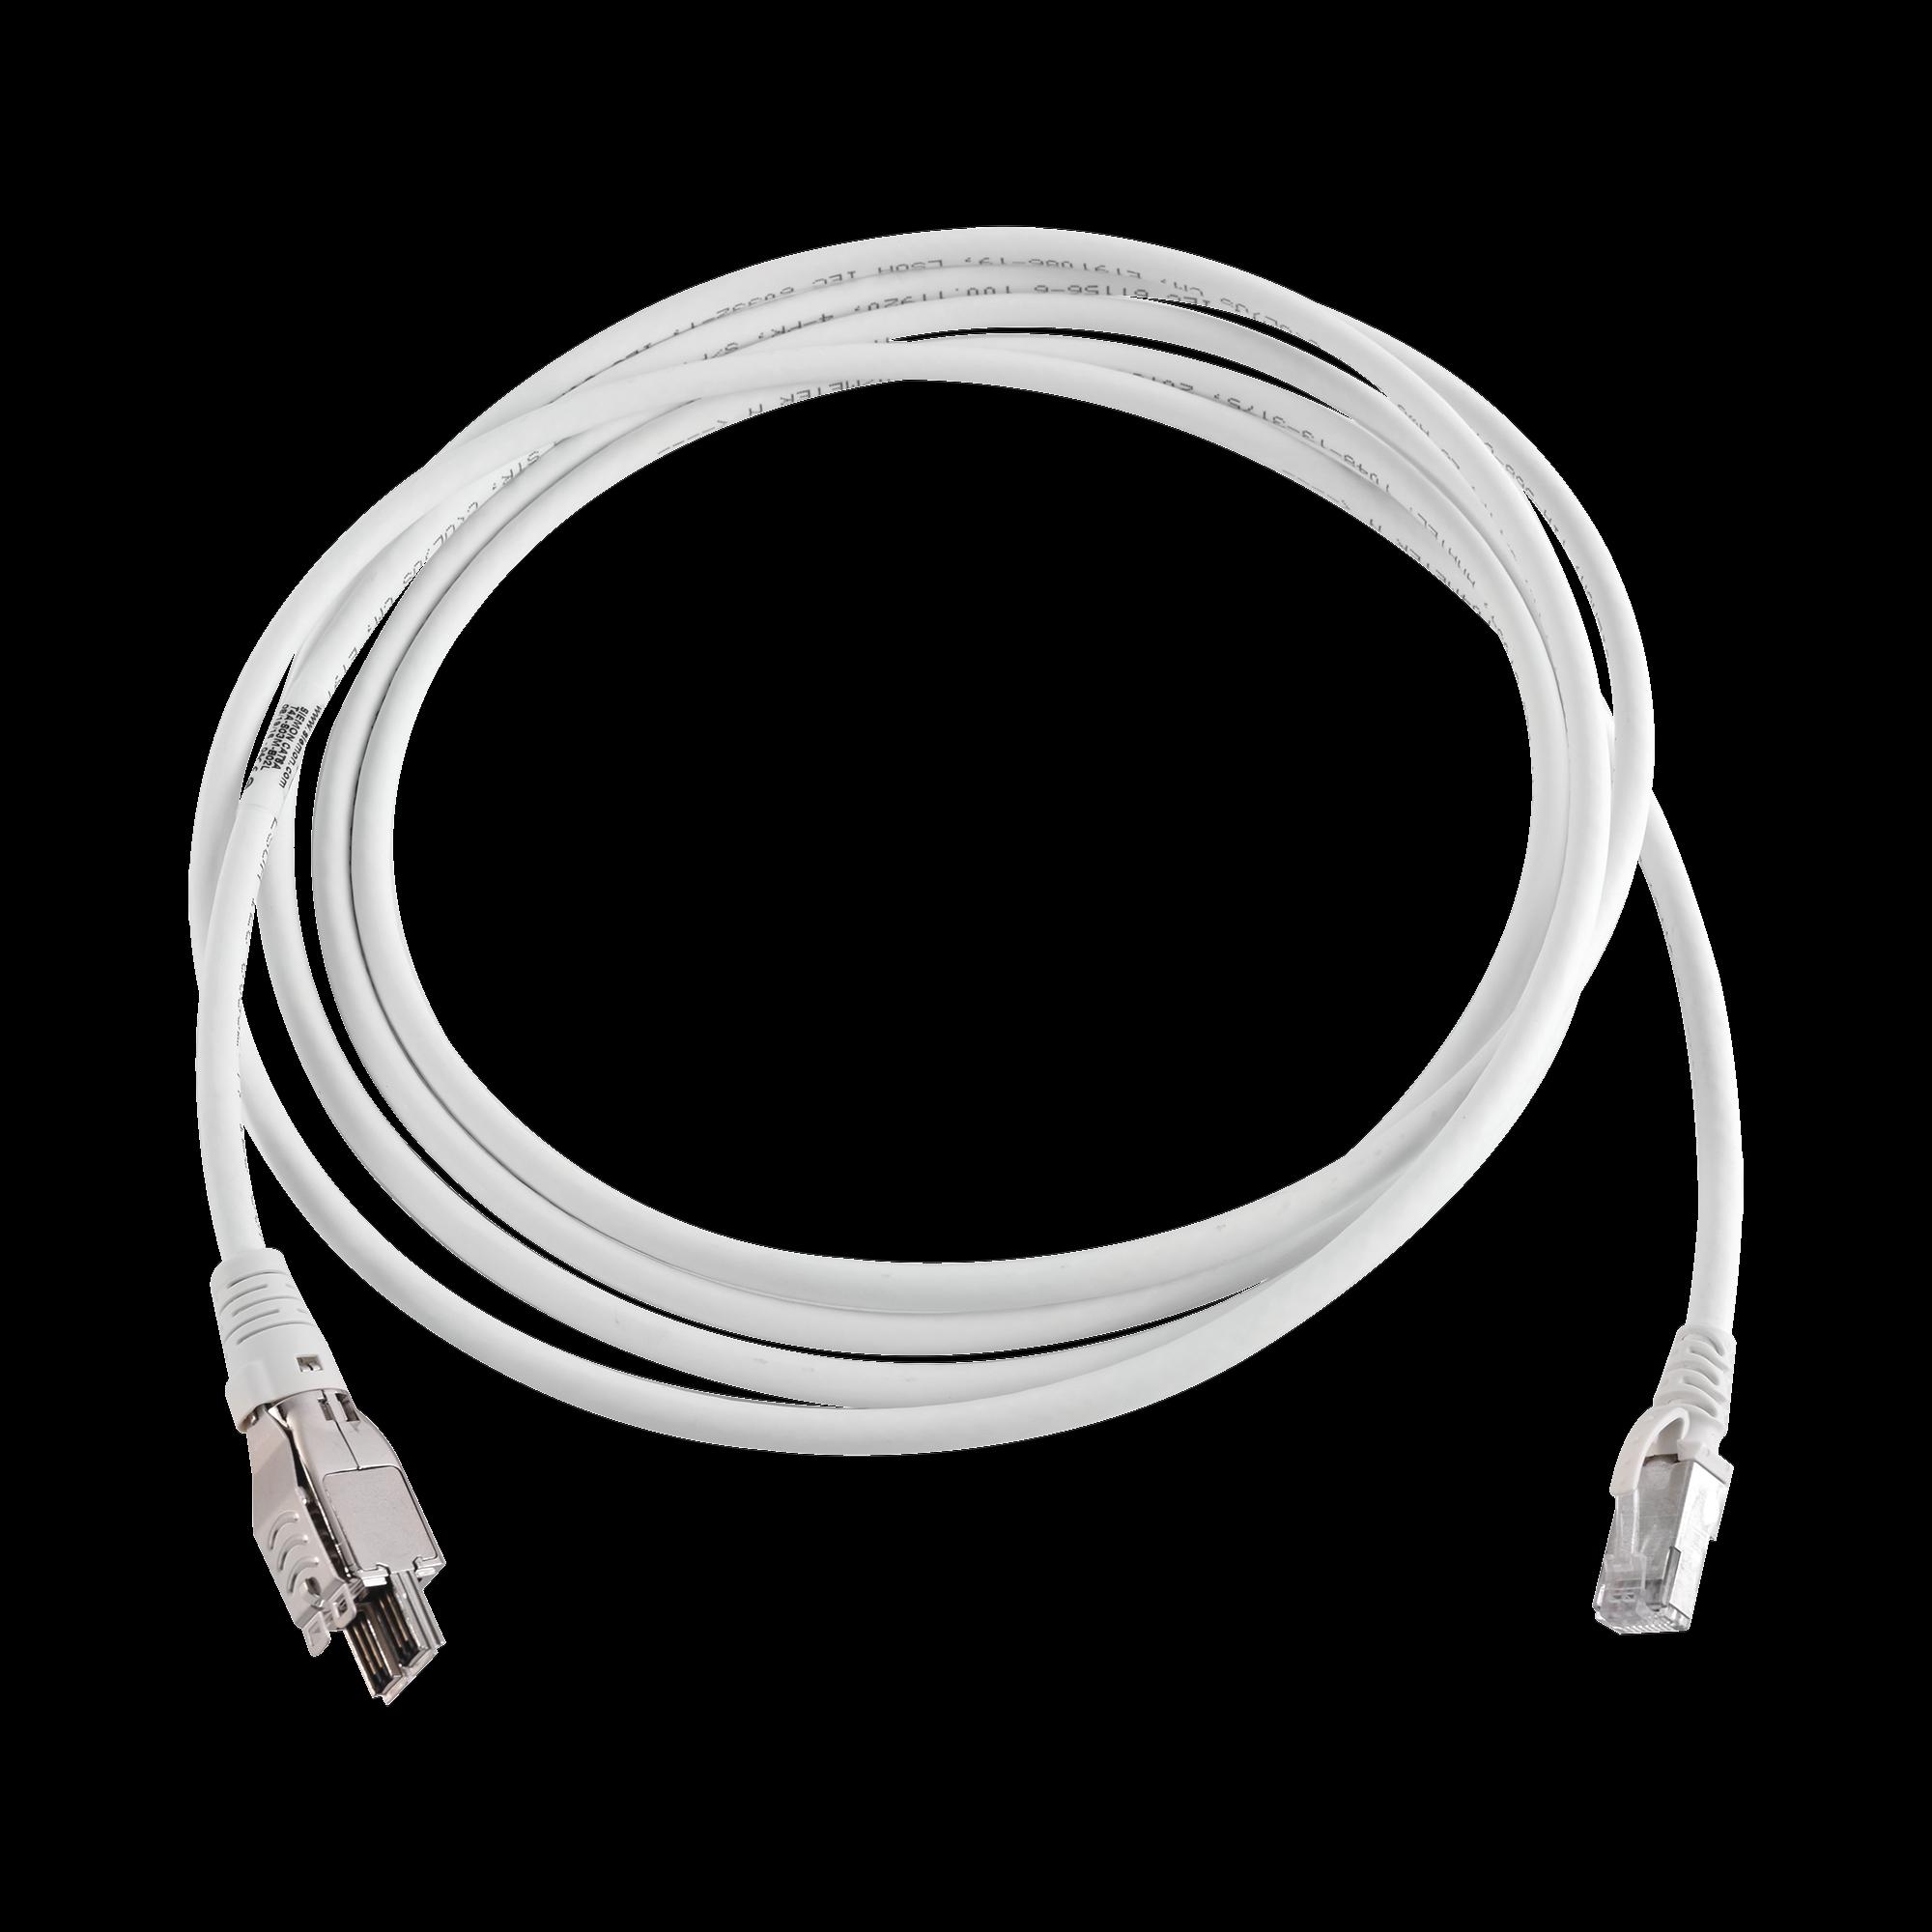 Patch Cord TERA Cat6A 1/10G Ethernet, de 4 pares y conector modular, LS0H, Color Marfil, 10m